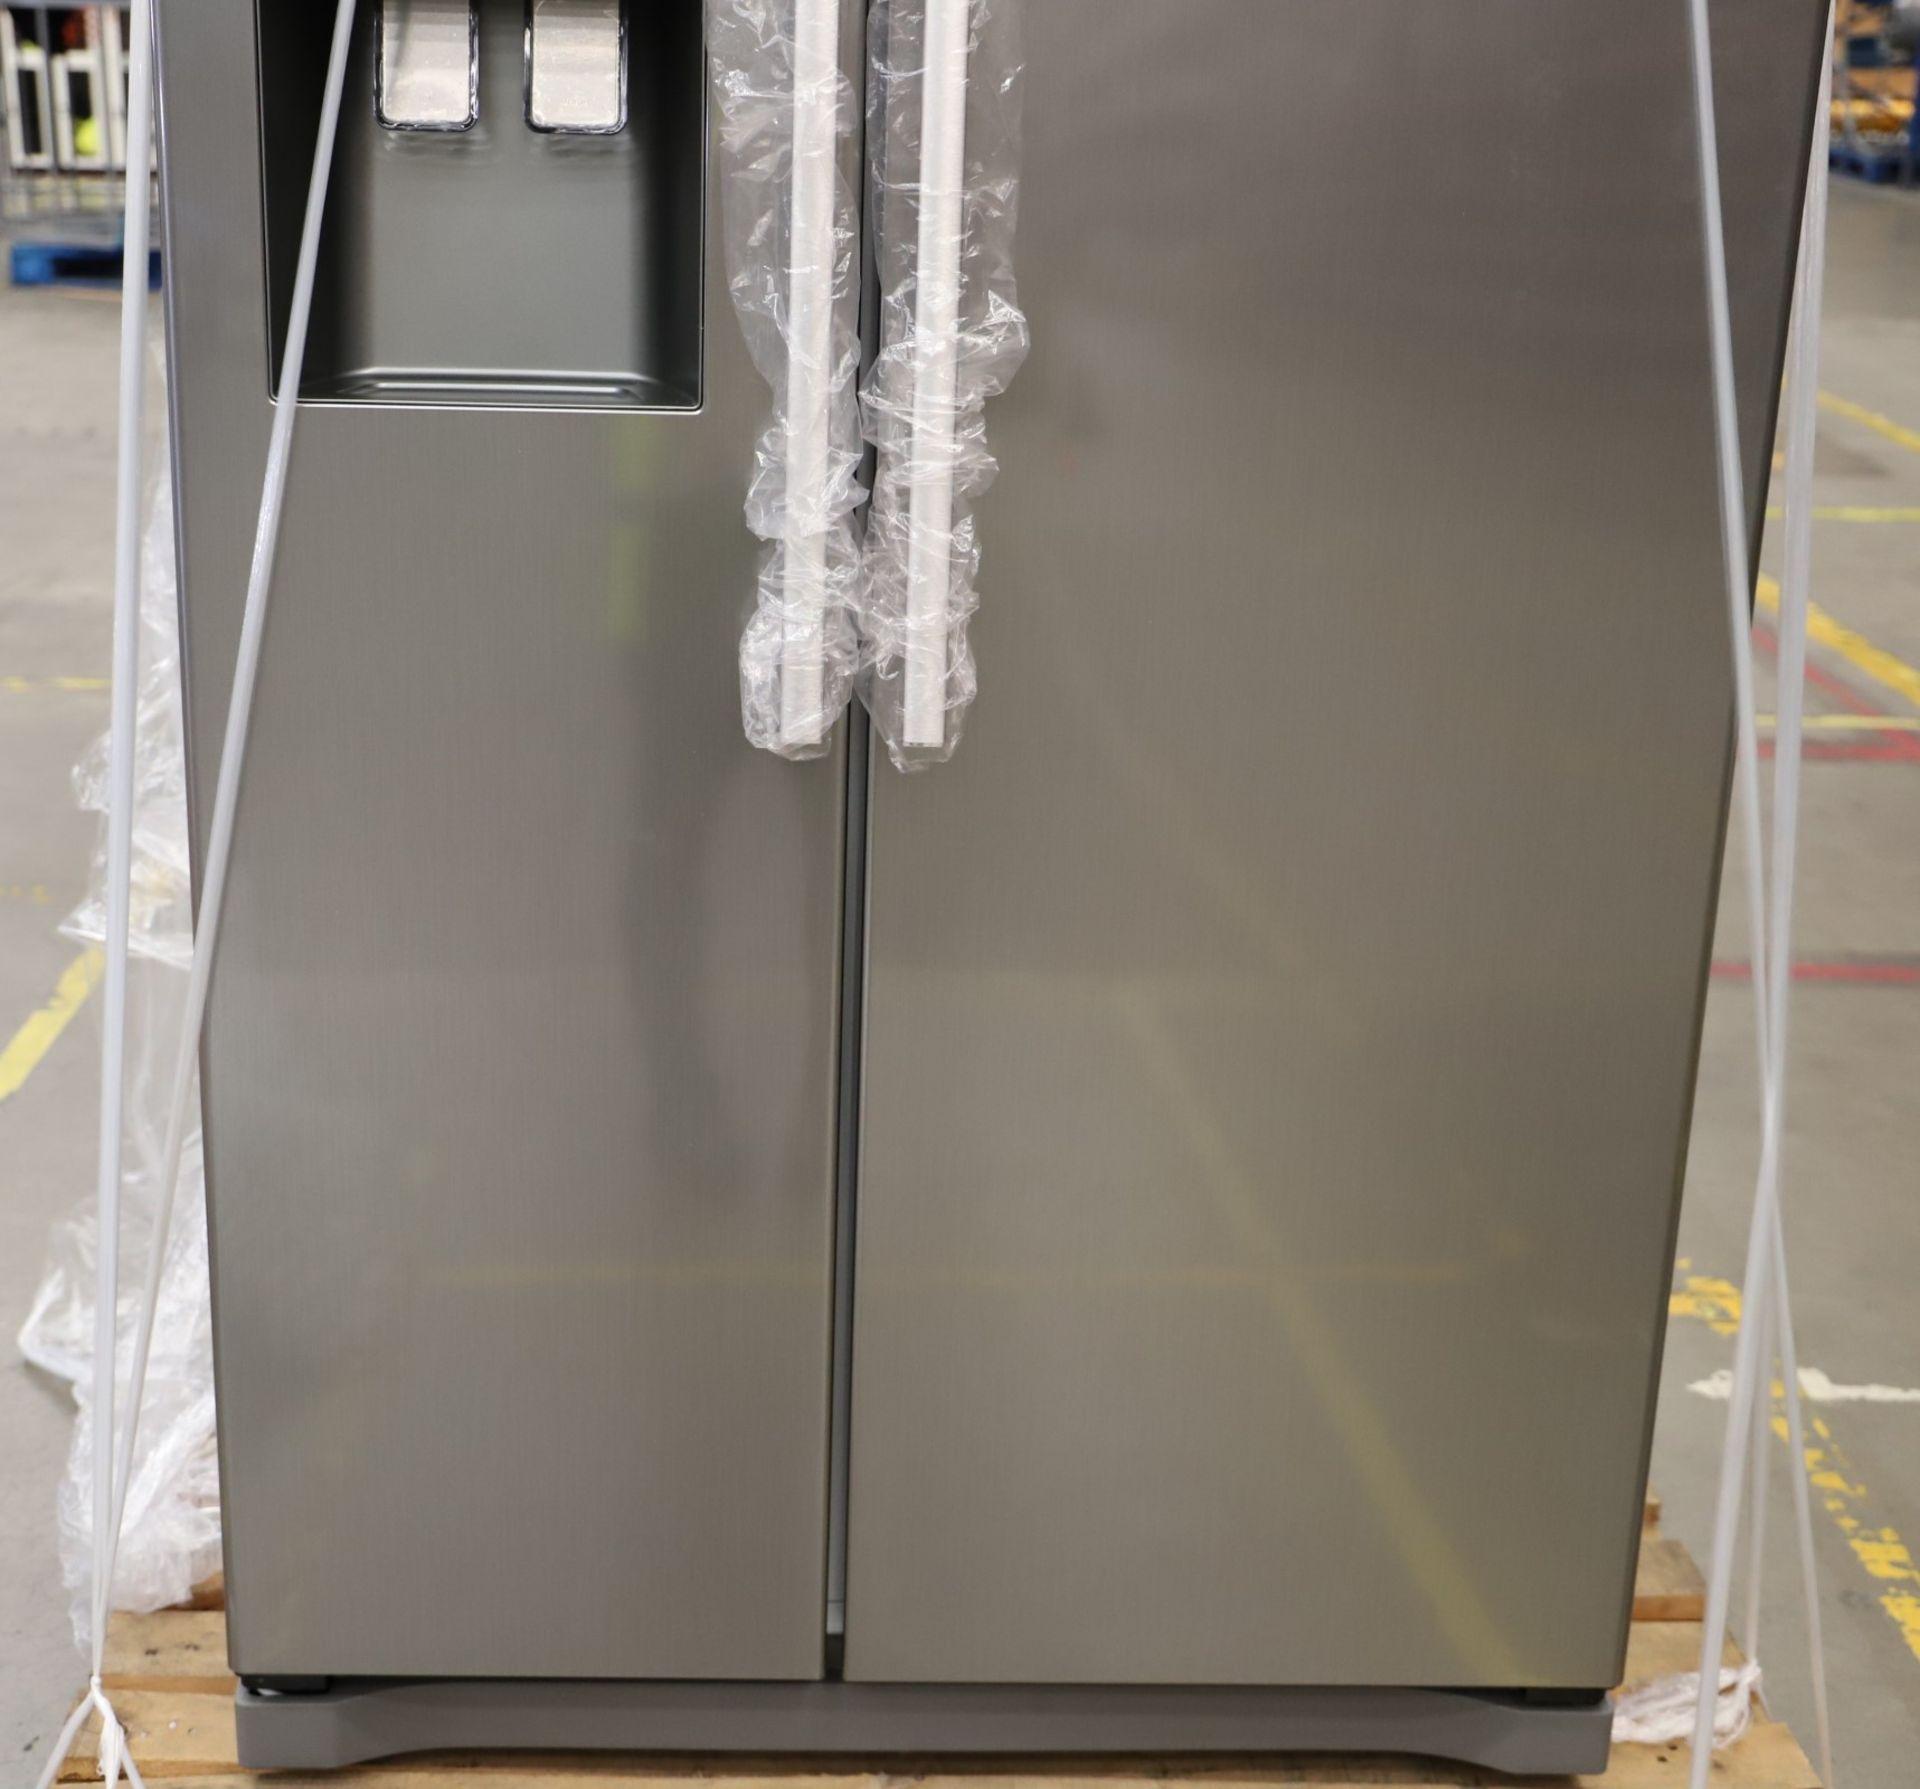 Pallet of 1 Samsung Water & Ice Fridge freezer. Latest selling price £929.99* - Image 9 of 9